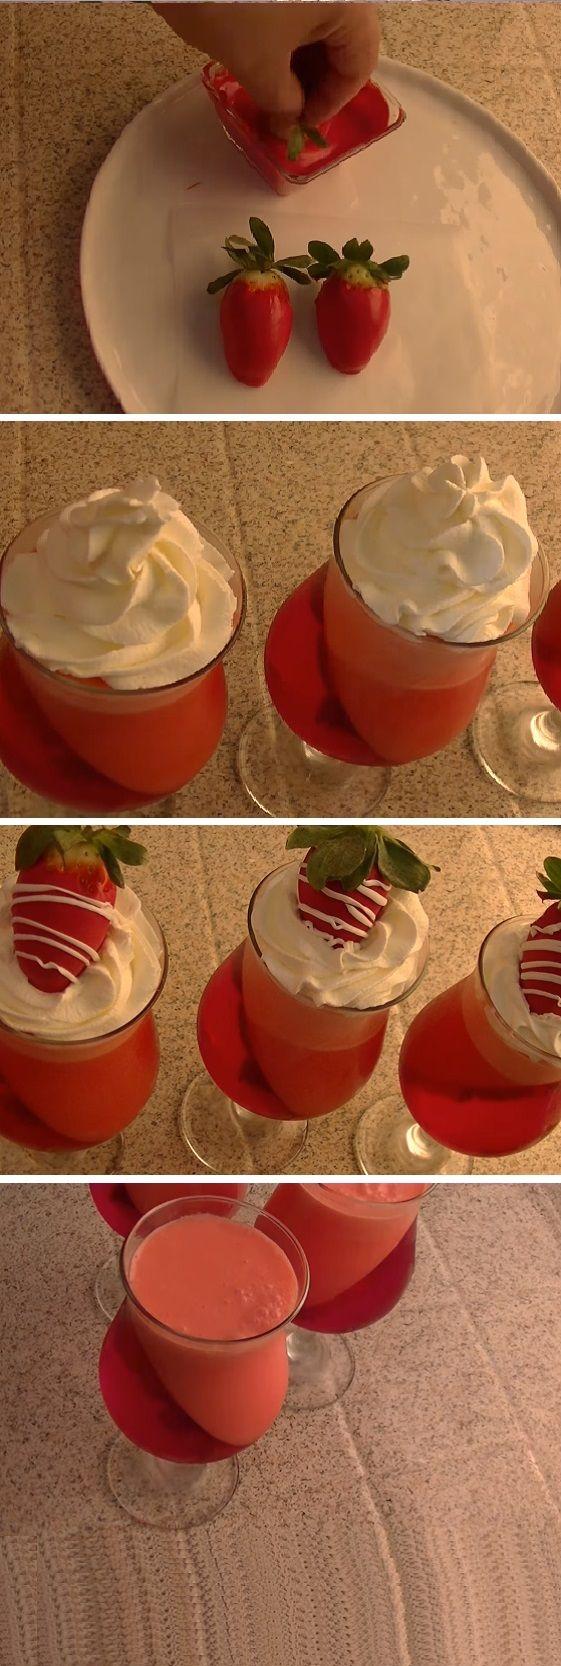 Postre San Valentín Romantico y Facil! Recetas románticas¨ #sanvalentin #valentinesday #valentine #love #azúcar #tips #cupcakes #cakes #dulces #receta #recipe #casero #torta #tartas #pastel #nestlecocina #bizcocho #bizcochuelo #tasty #cocina #chocolate #pan #panes Si te gusta dinos HOLA y dale a Me Gusta MIREN …